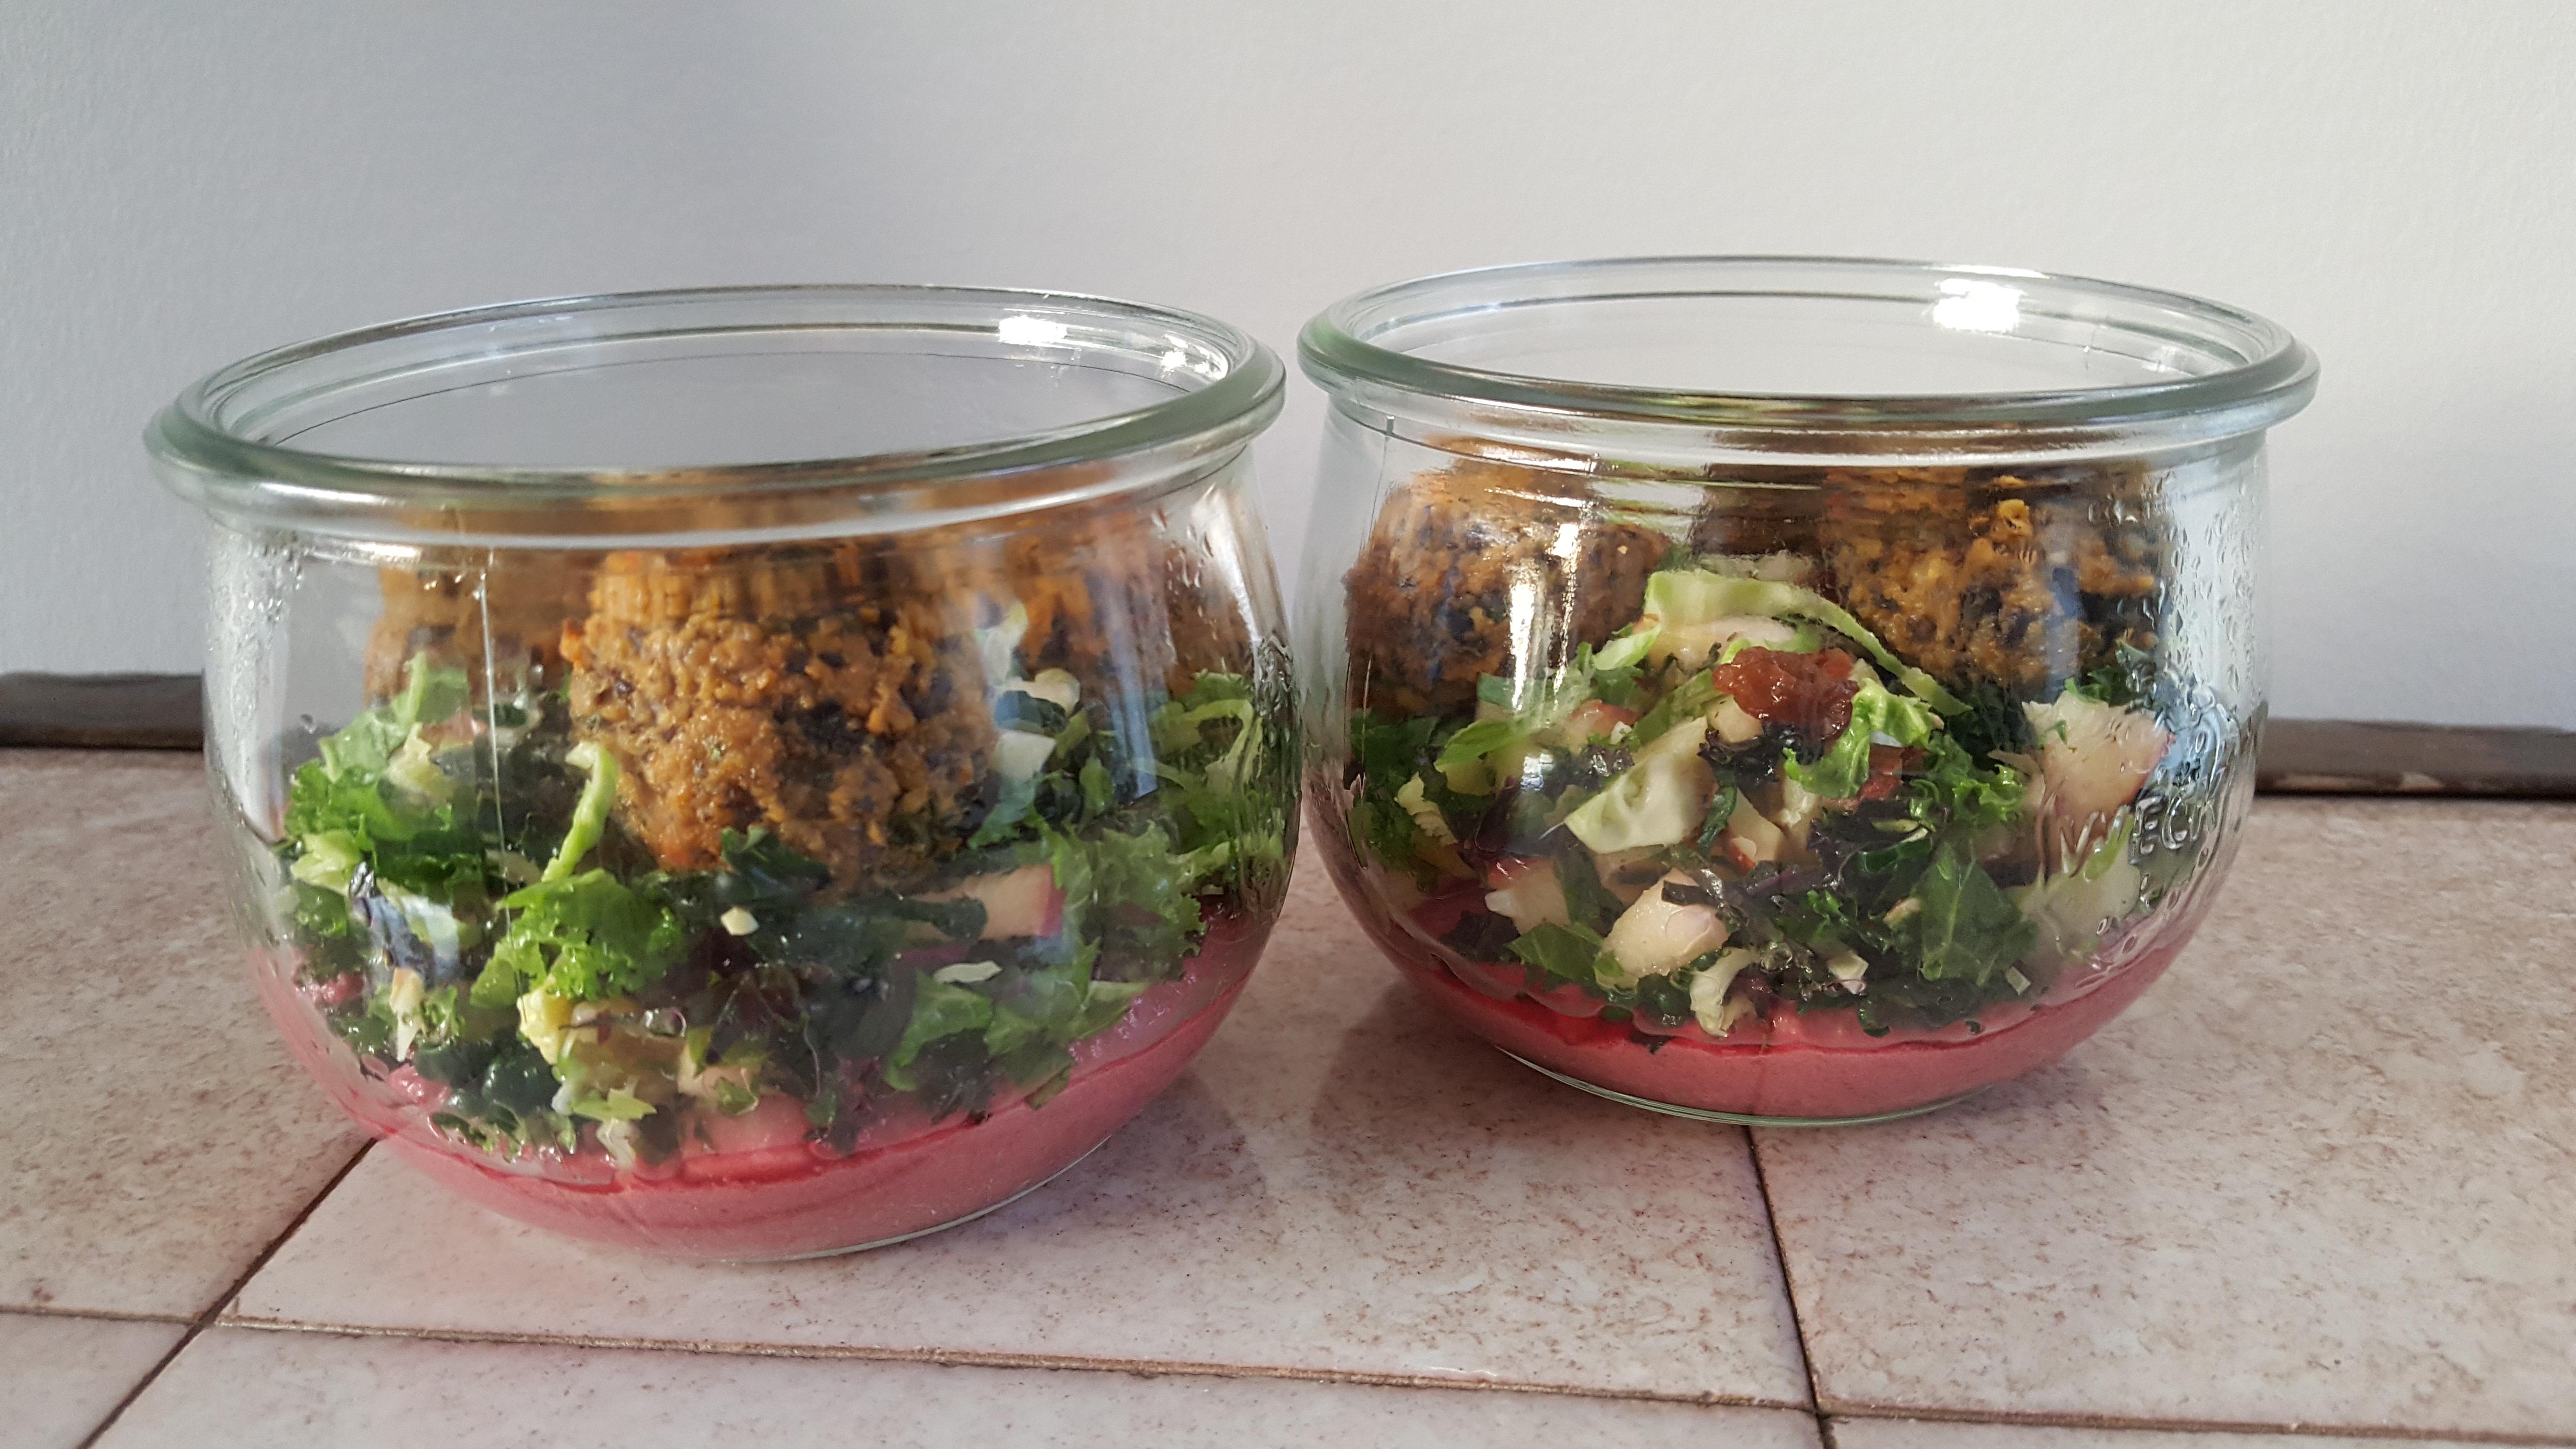 Salatglas med julehummus, grønkålssalat og falafler